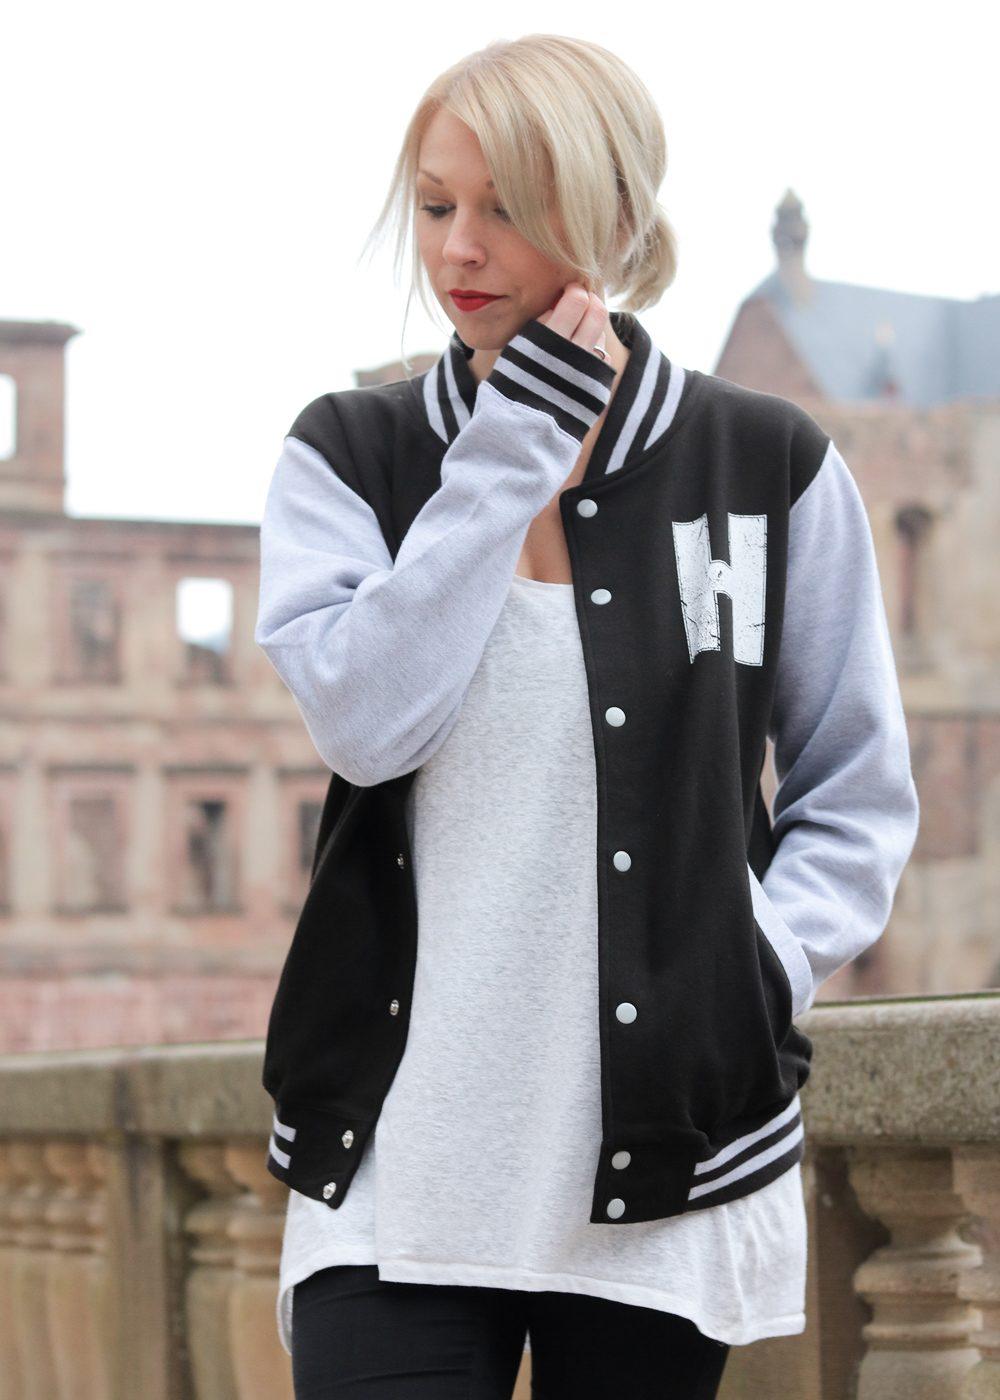 fashionblogger-outfit-emp-hogwarts-collegajcke-converse-lederchucks-skinnyjeans-13-von-20